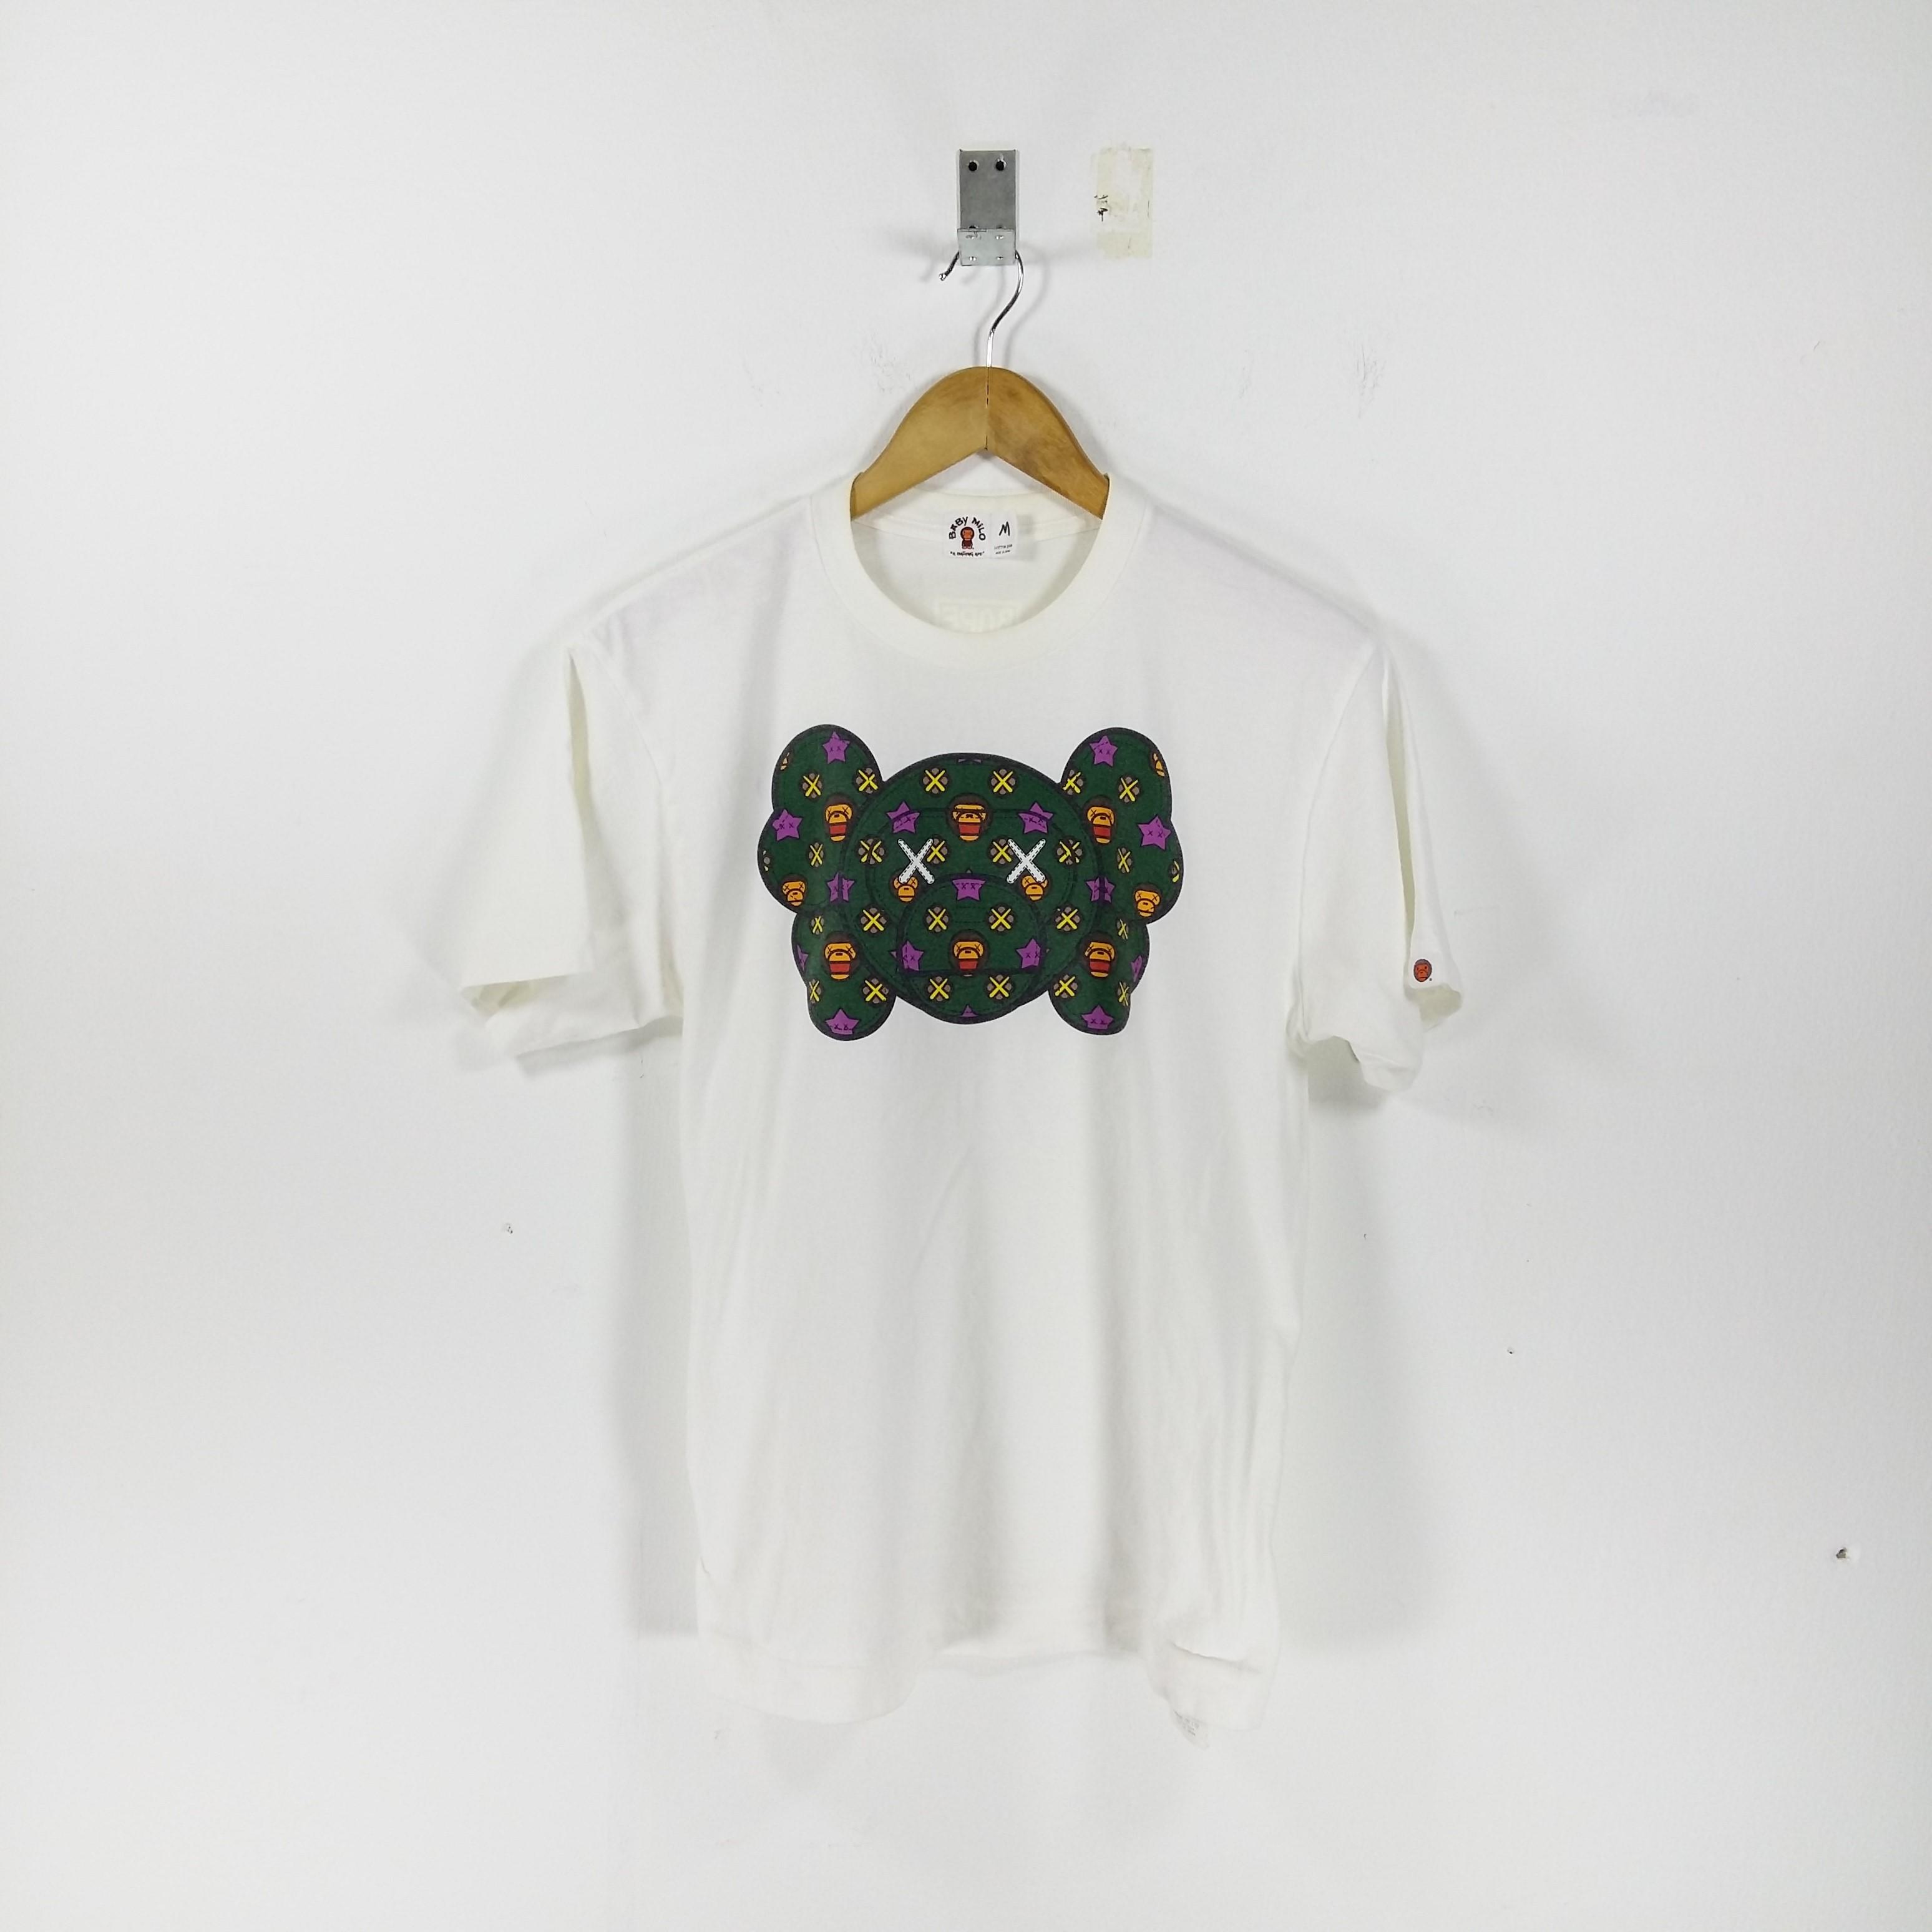 bab284bb4 Bape × Kaws ×. ( Need Gone Today )Baby Milo X KAWS By BATHING APE White  Tshirt Short Sleeve Logo Print Size Medium